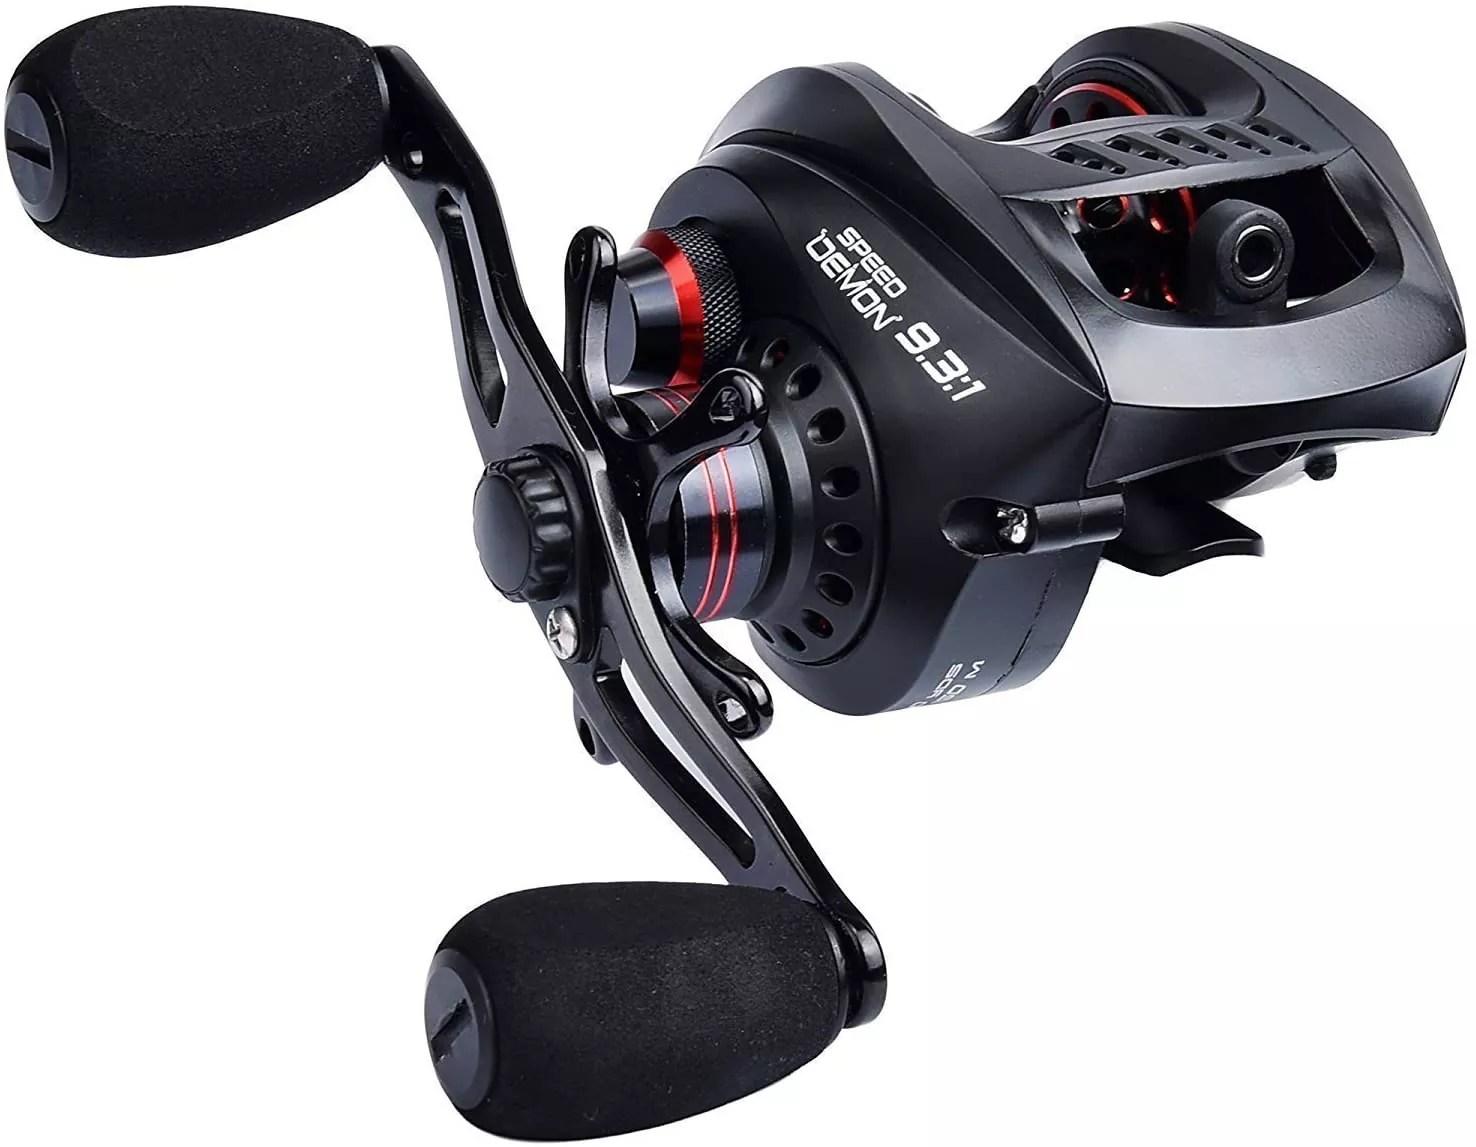 KastKing Speed Demon 9.3:1 Baitcasting Fishing Reel